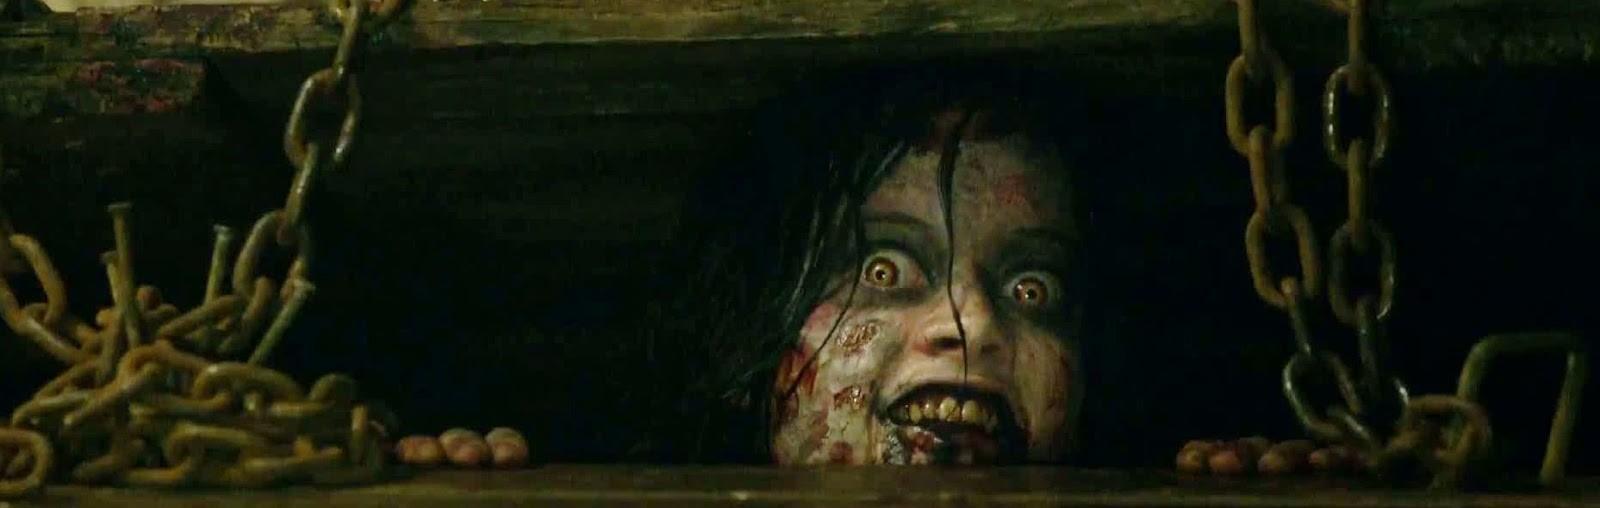 Evil Dead isn't a movie. It's a rollercoaster.